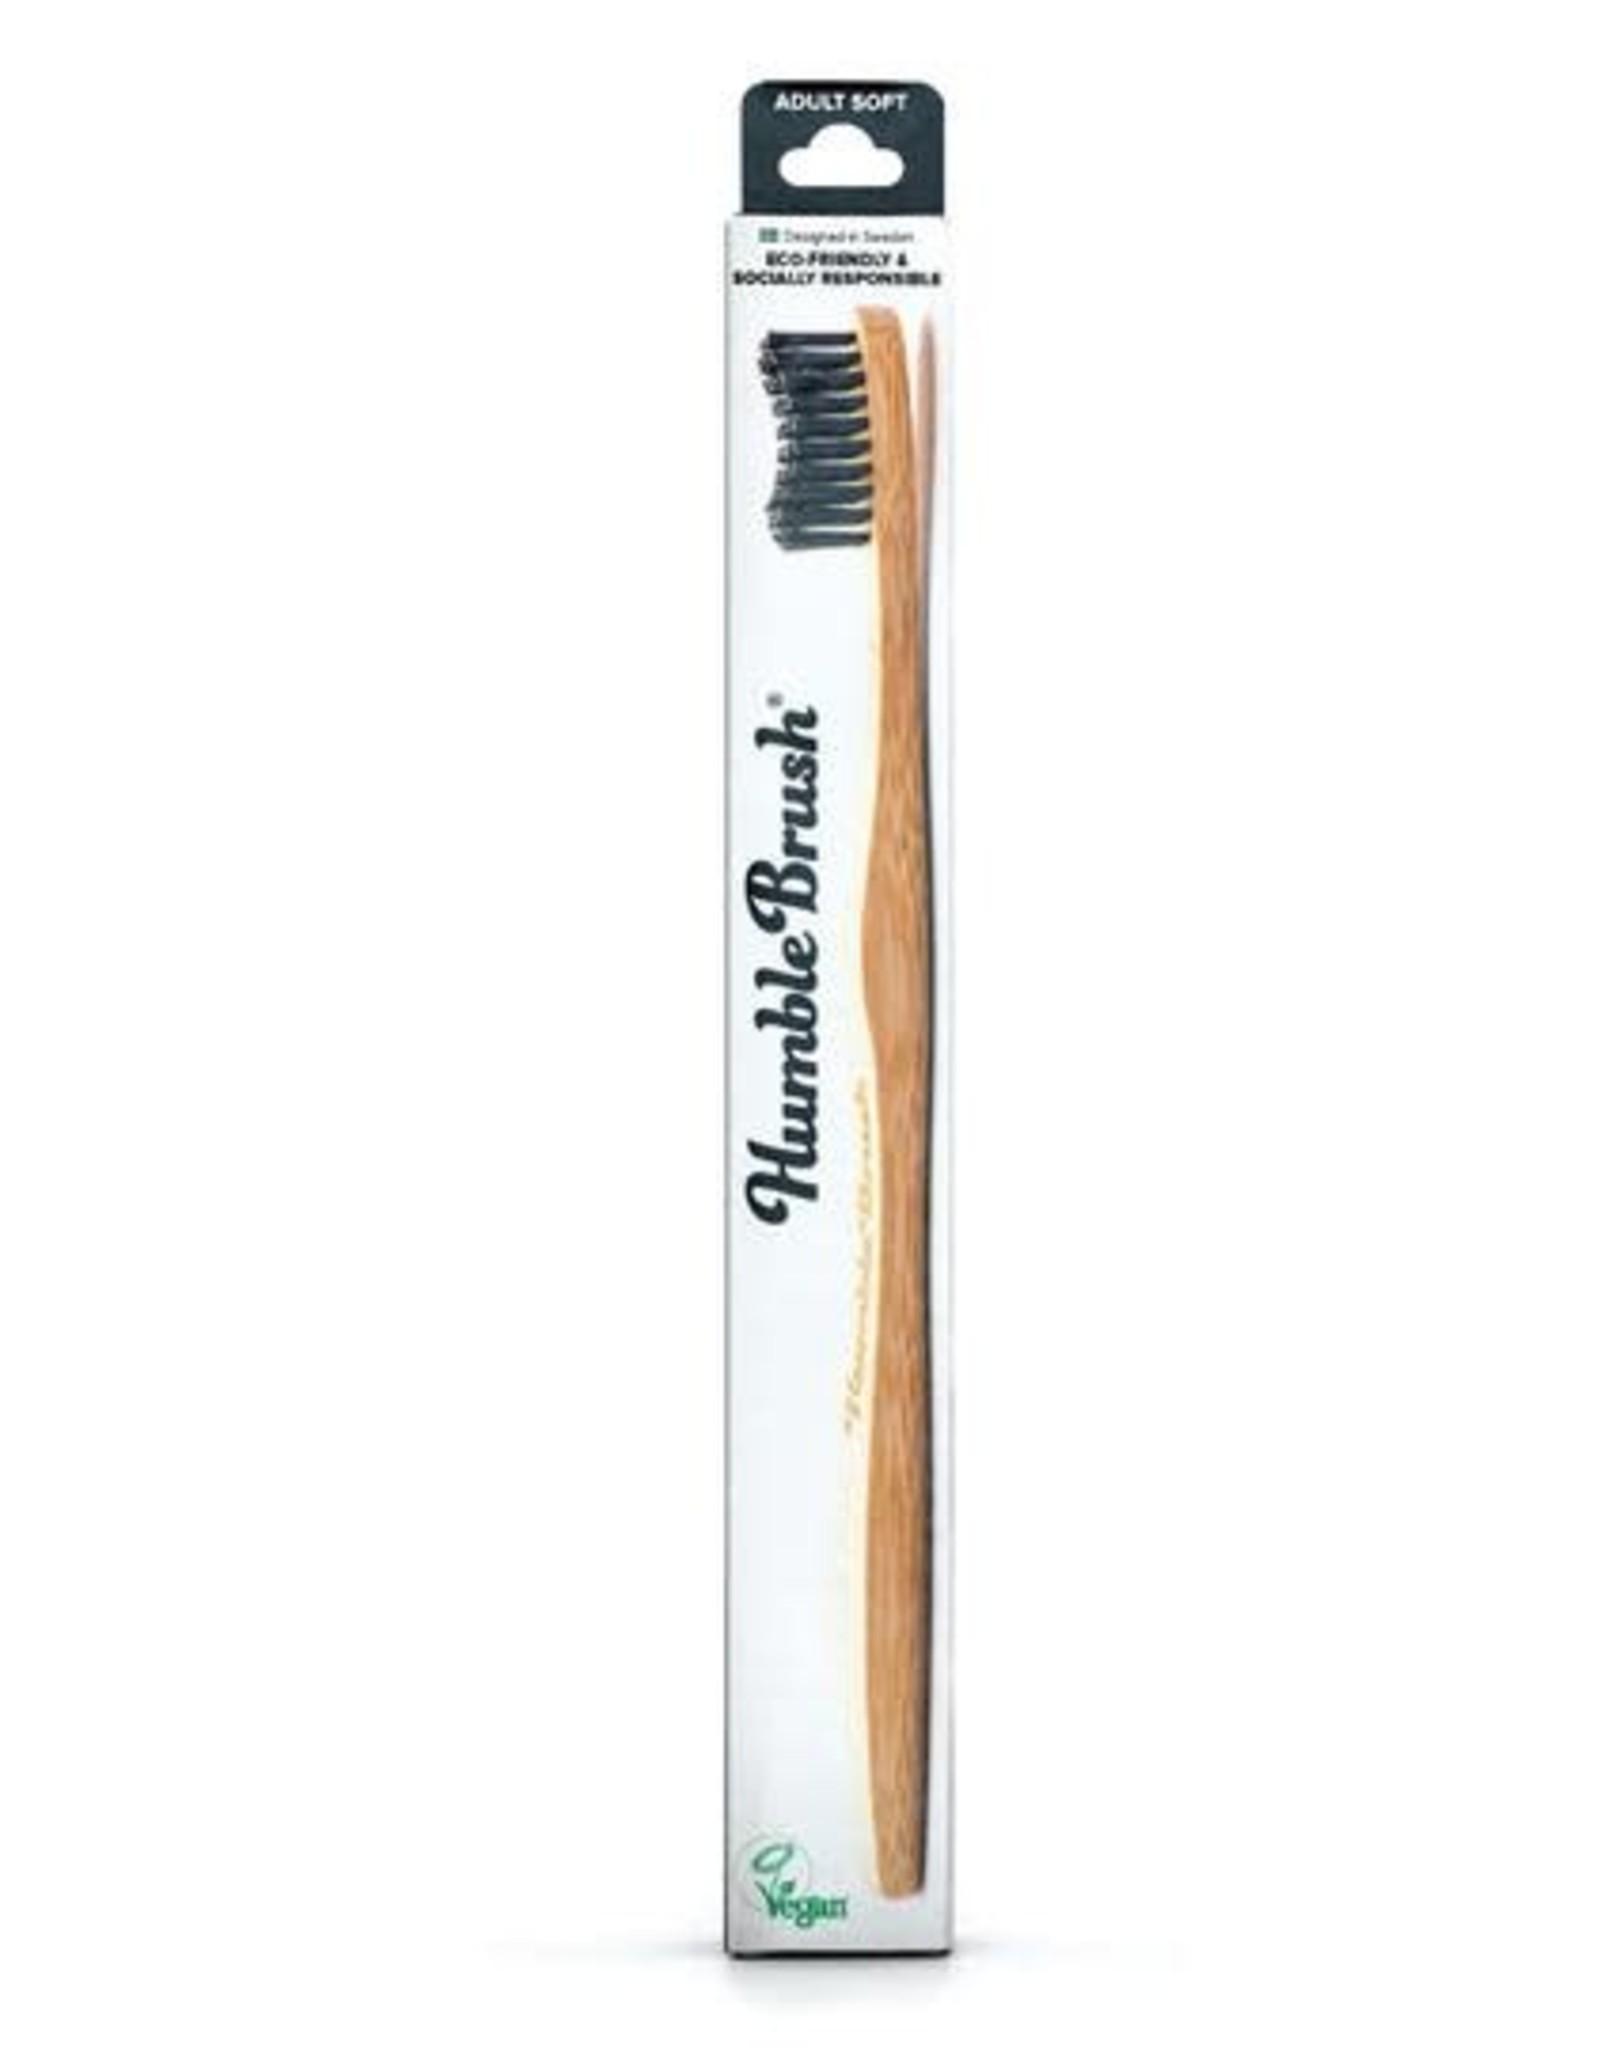 The Humble Co. Humble Brush Toothbrush Black Ultra Soft